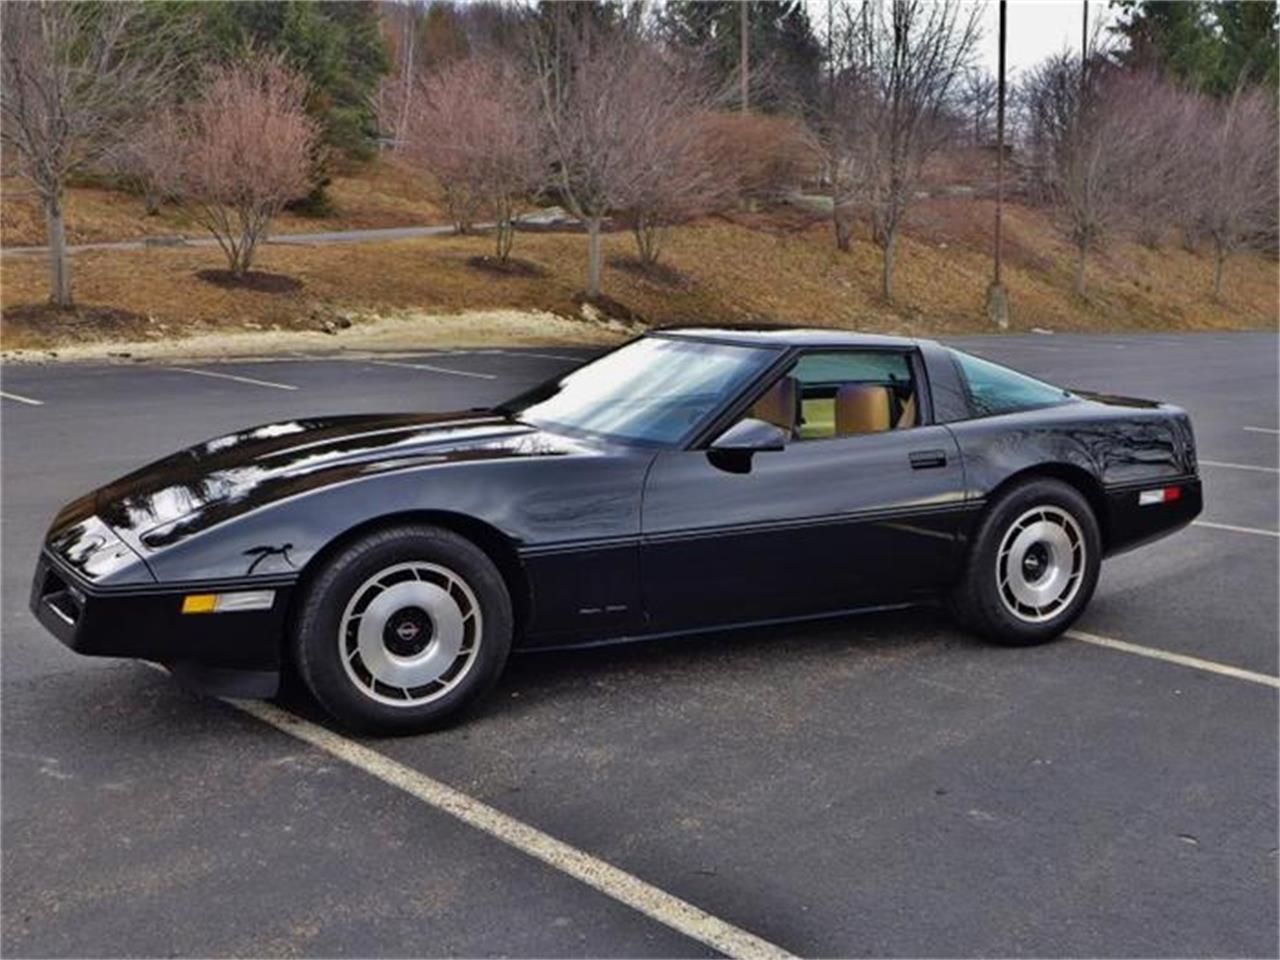 Large Picture of '84 Chevrolet Corvette located in Pennsylvania - $12,900.00 - E50Y